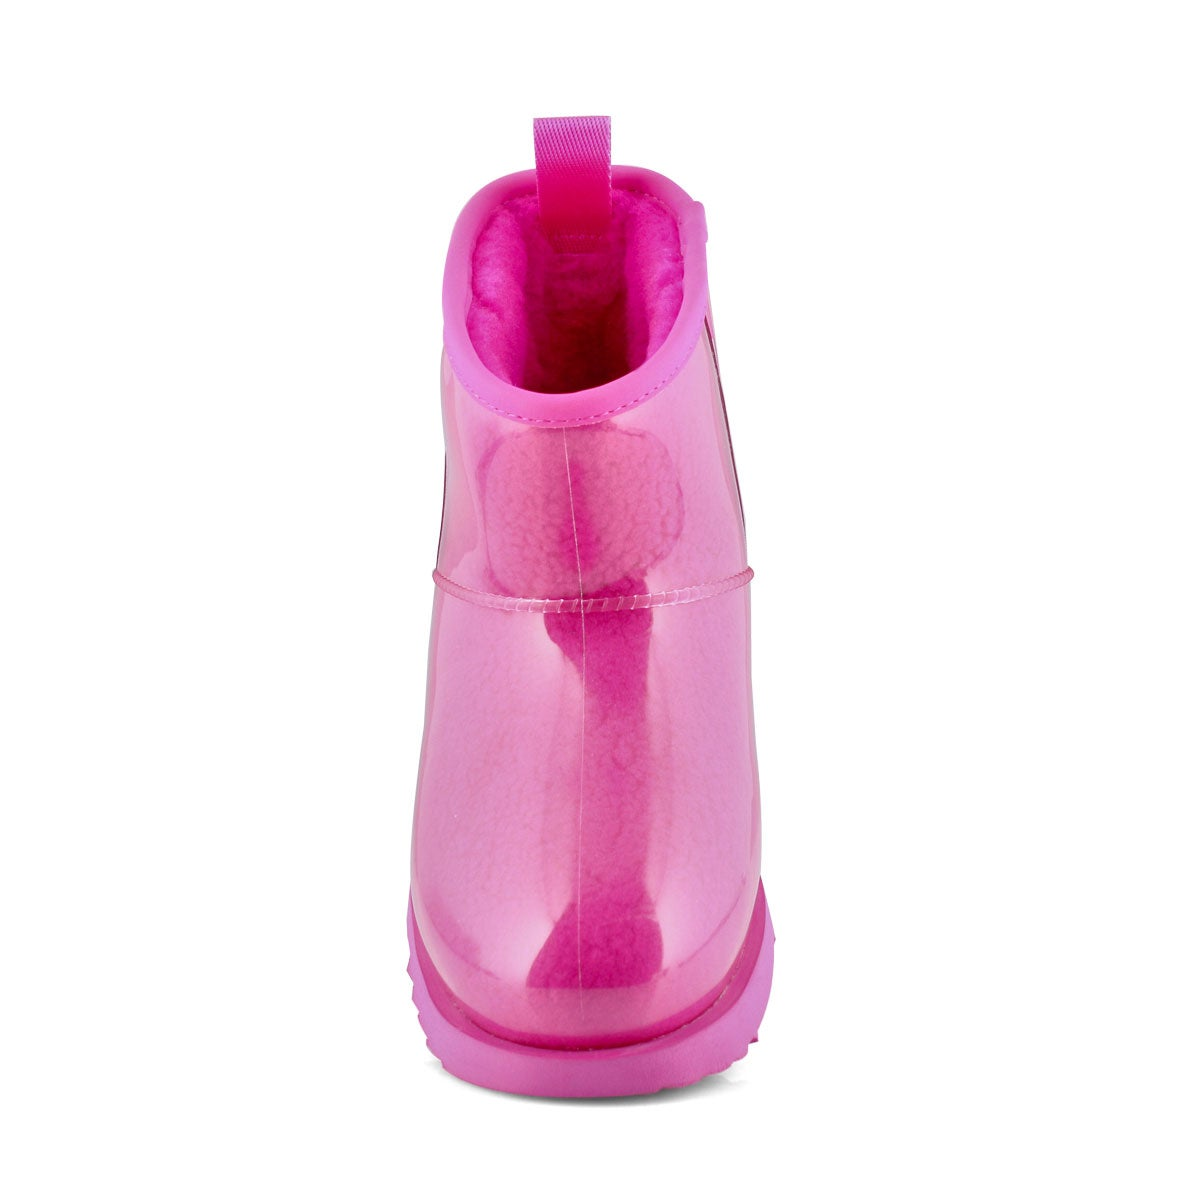 Bottes CLASSIC CLEAR MINI II, rose marbré, filles